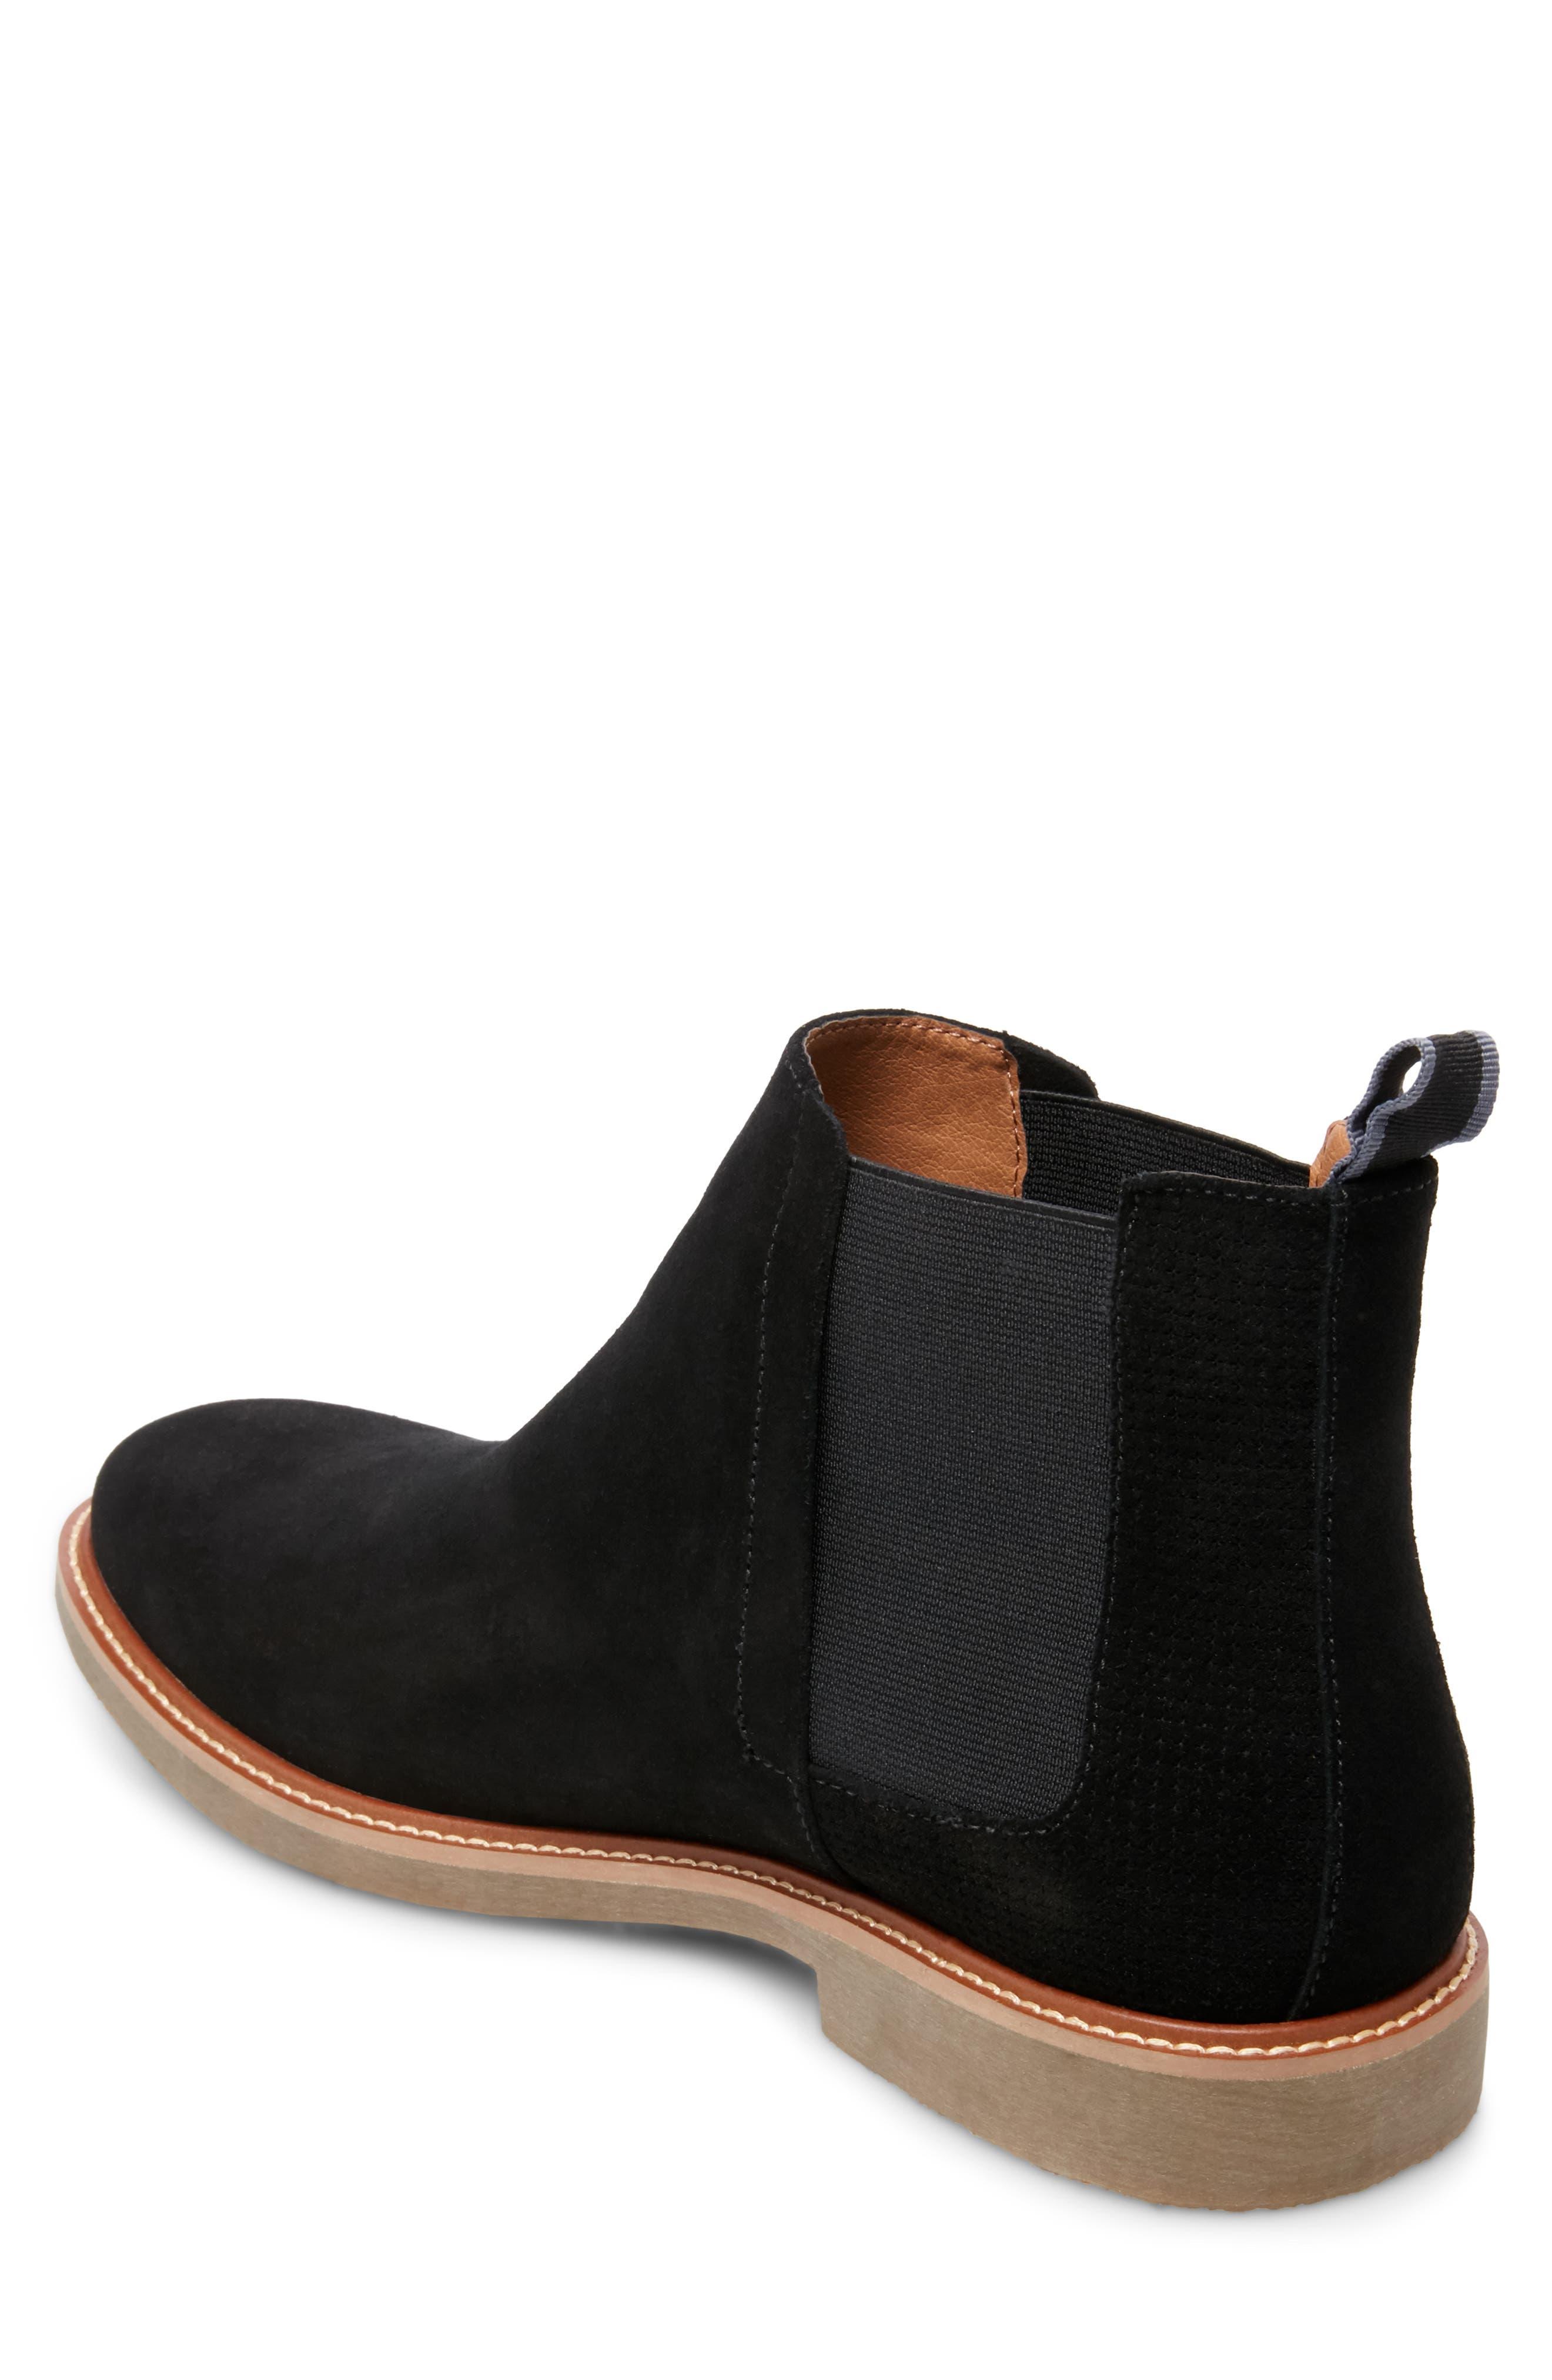 STEVE MADDEN, Highlyte Textured Chelsea Boot, Alternate thumbnail 2, color, BLACK SUEDE